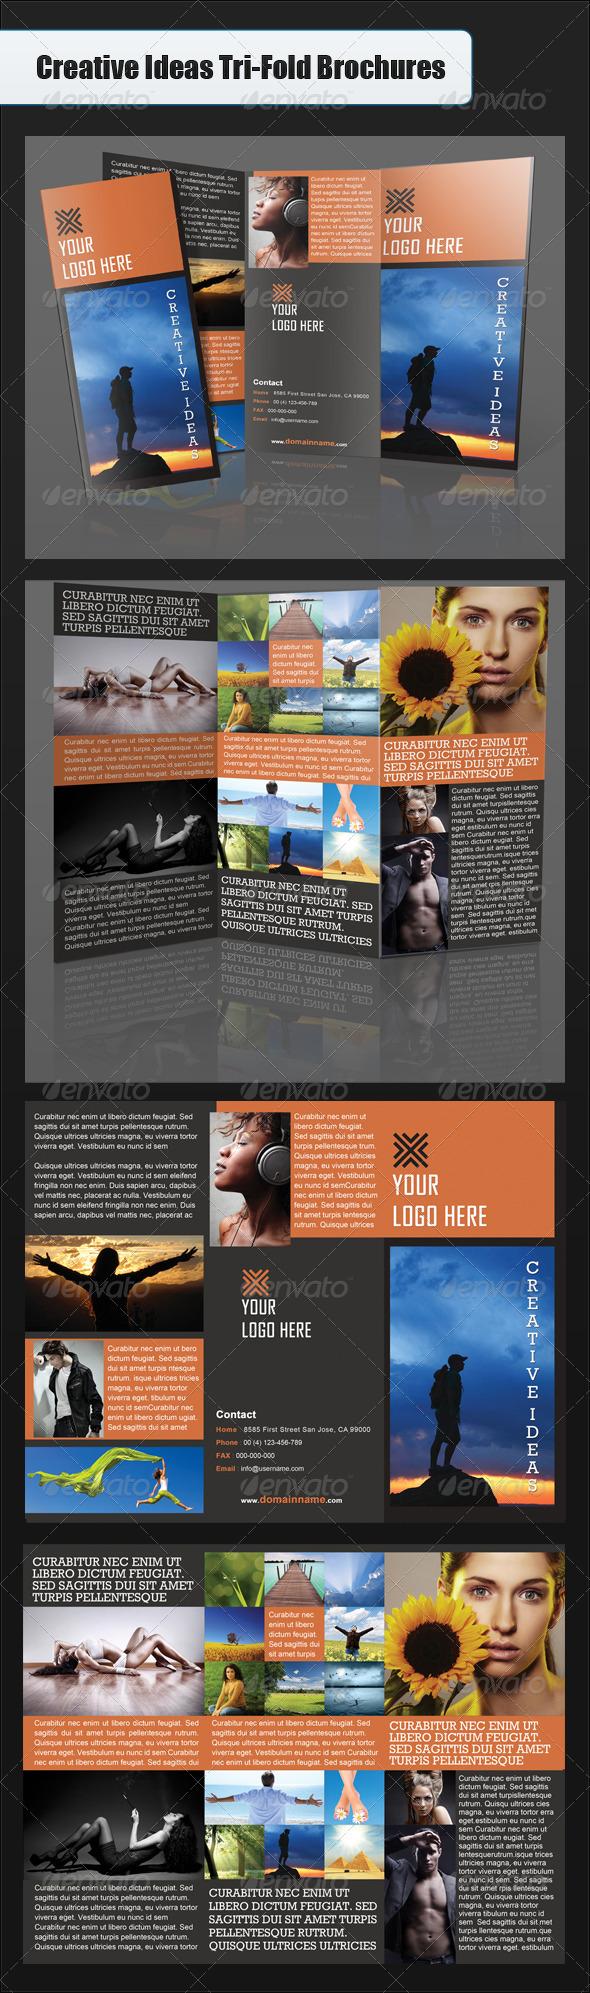 Creative Ideas Tri-Fold Brochure - Brochures Print Templates